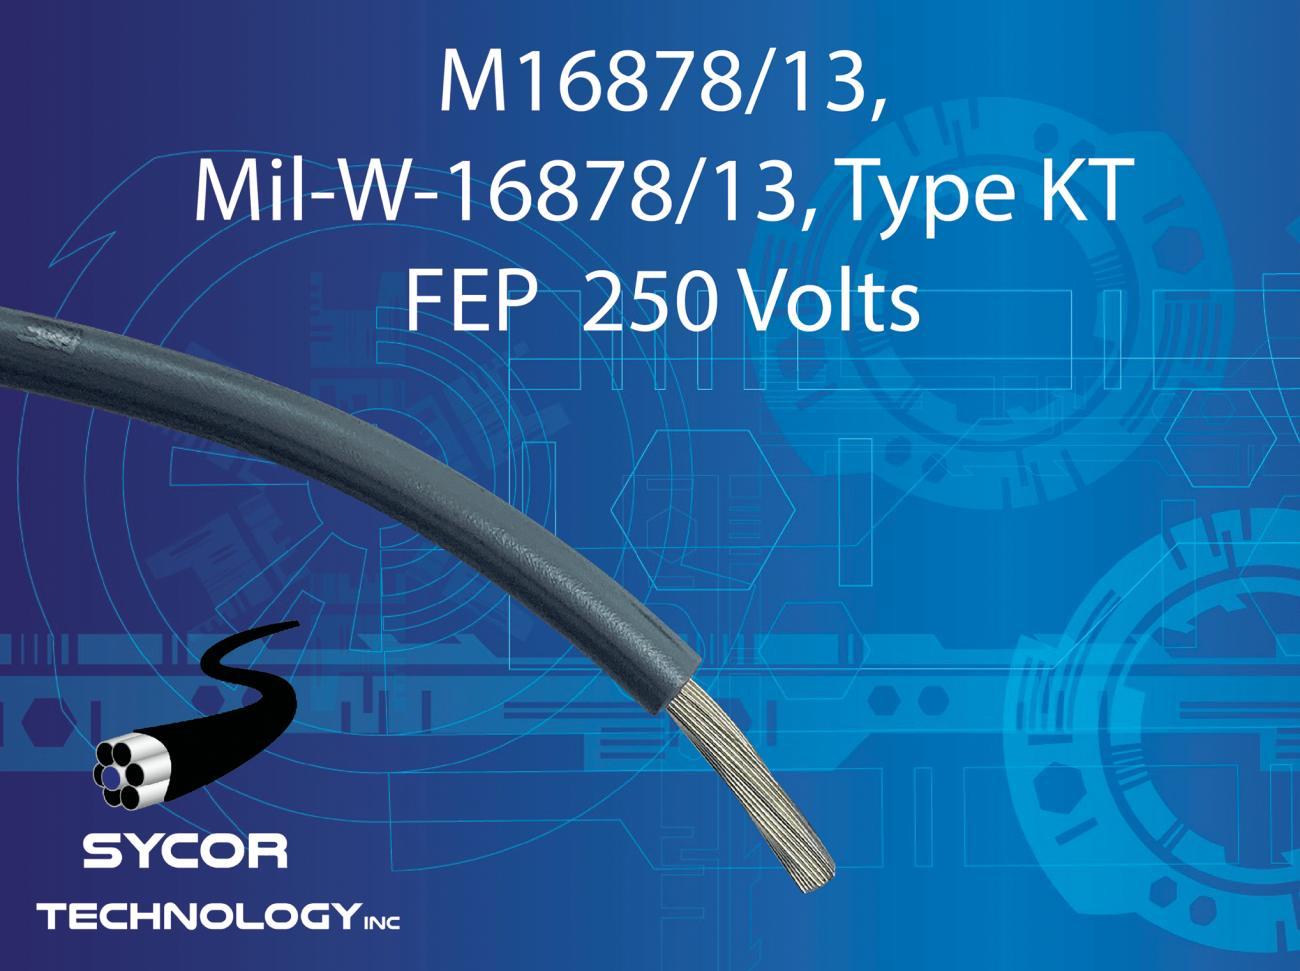 M16878/13, MIL-W-16878/13, Type KT wire